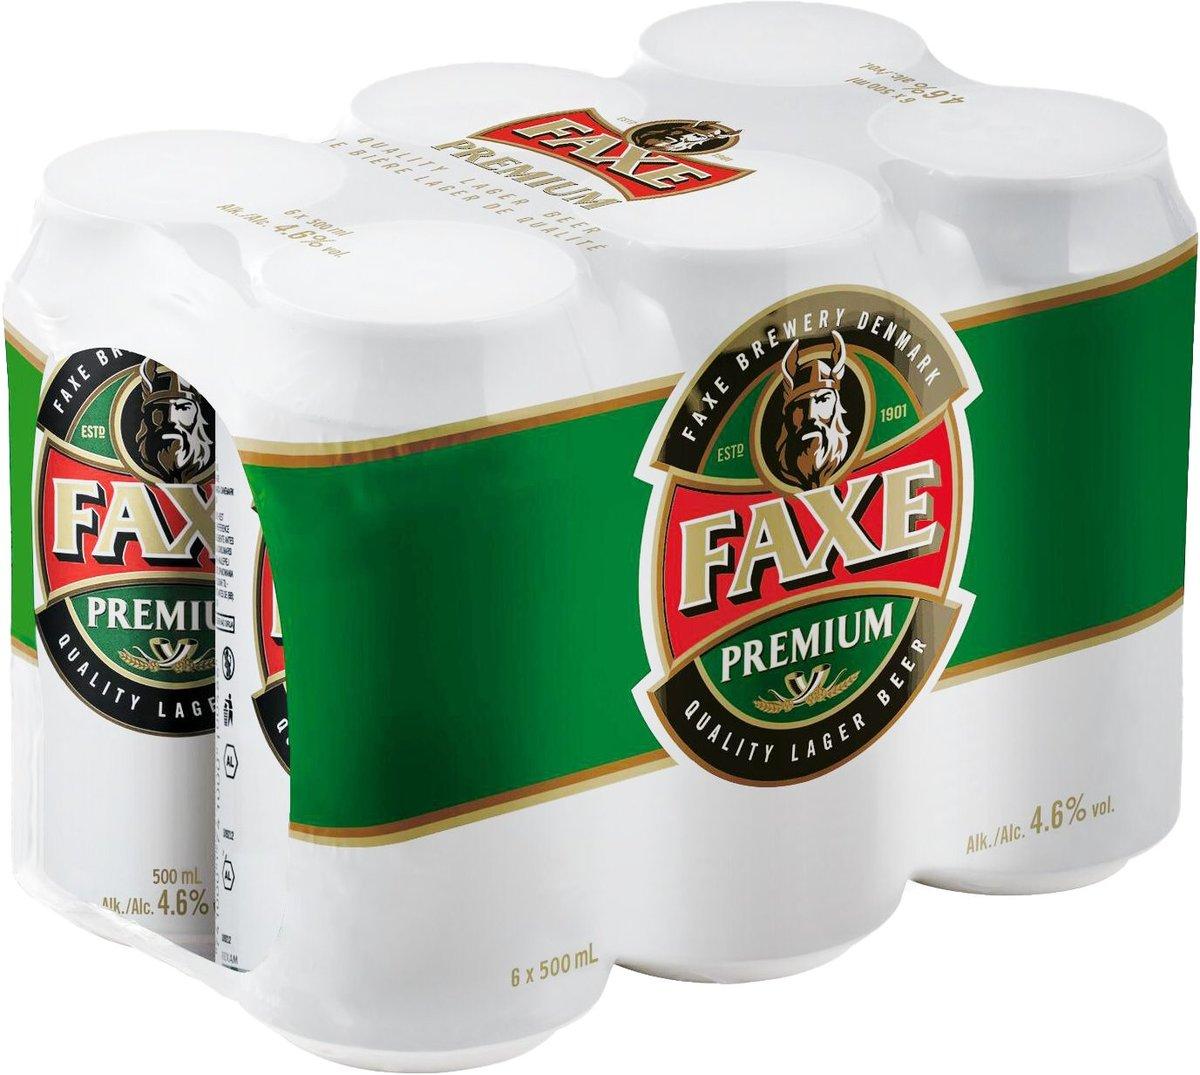 (大罐) FAXE 優質Lager 啤酒 (500毫升 X 6)